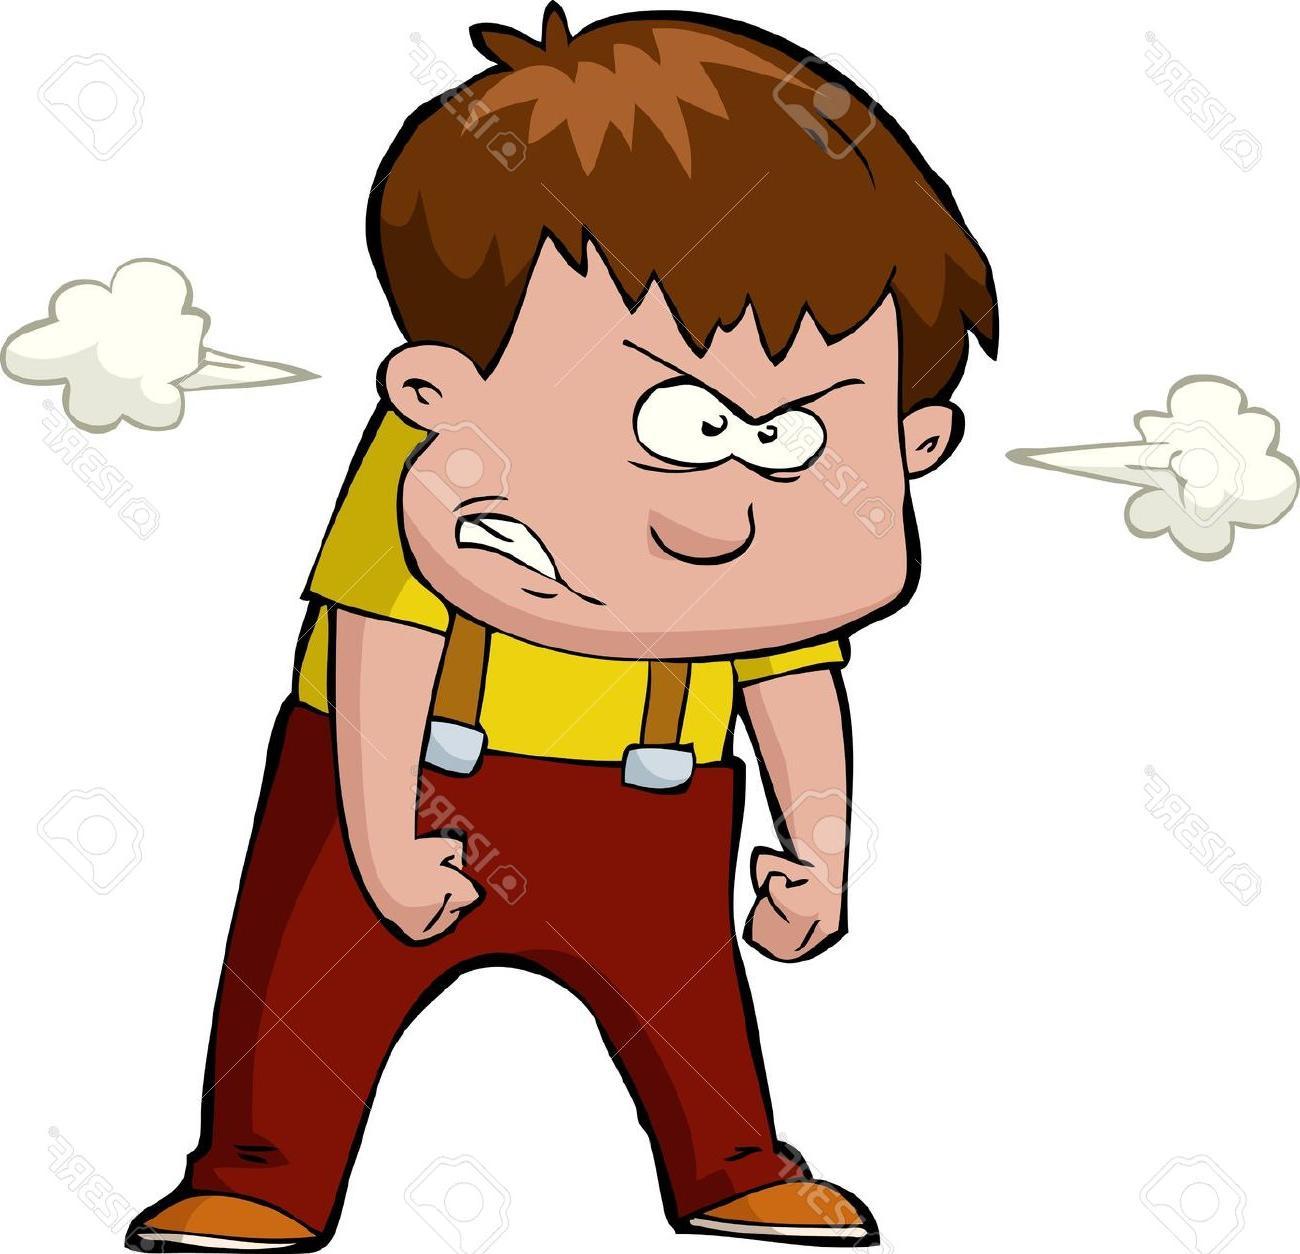 Anger clipart angry teenager, Anger angry teenager.